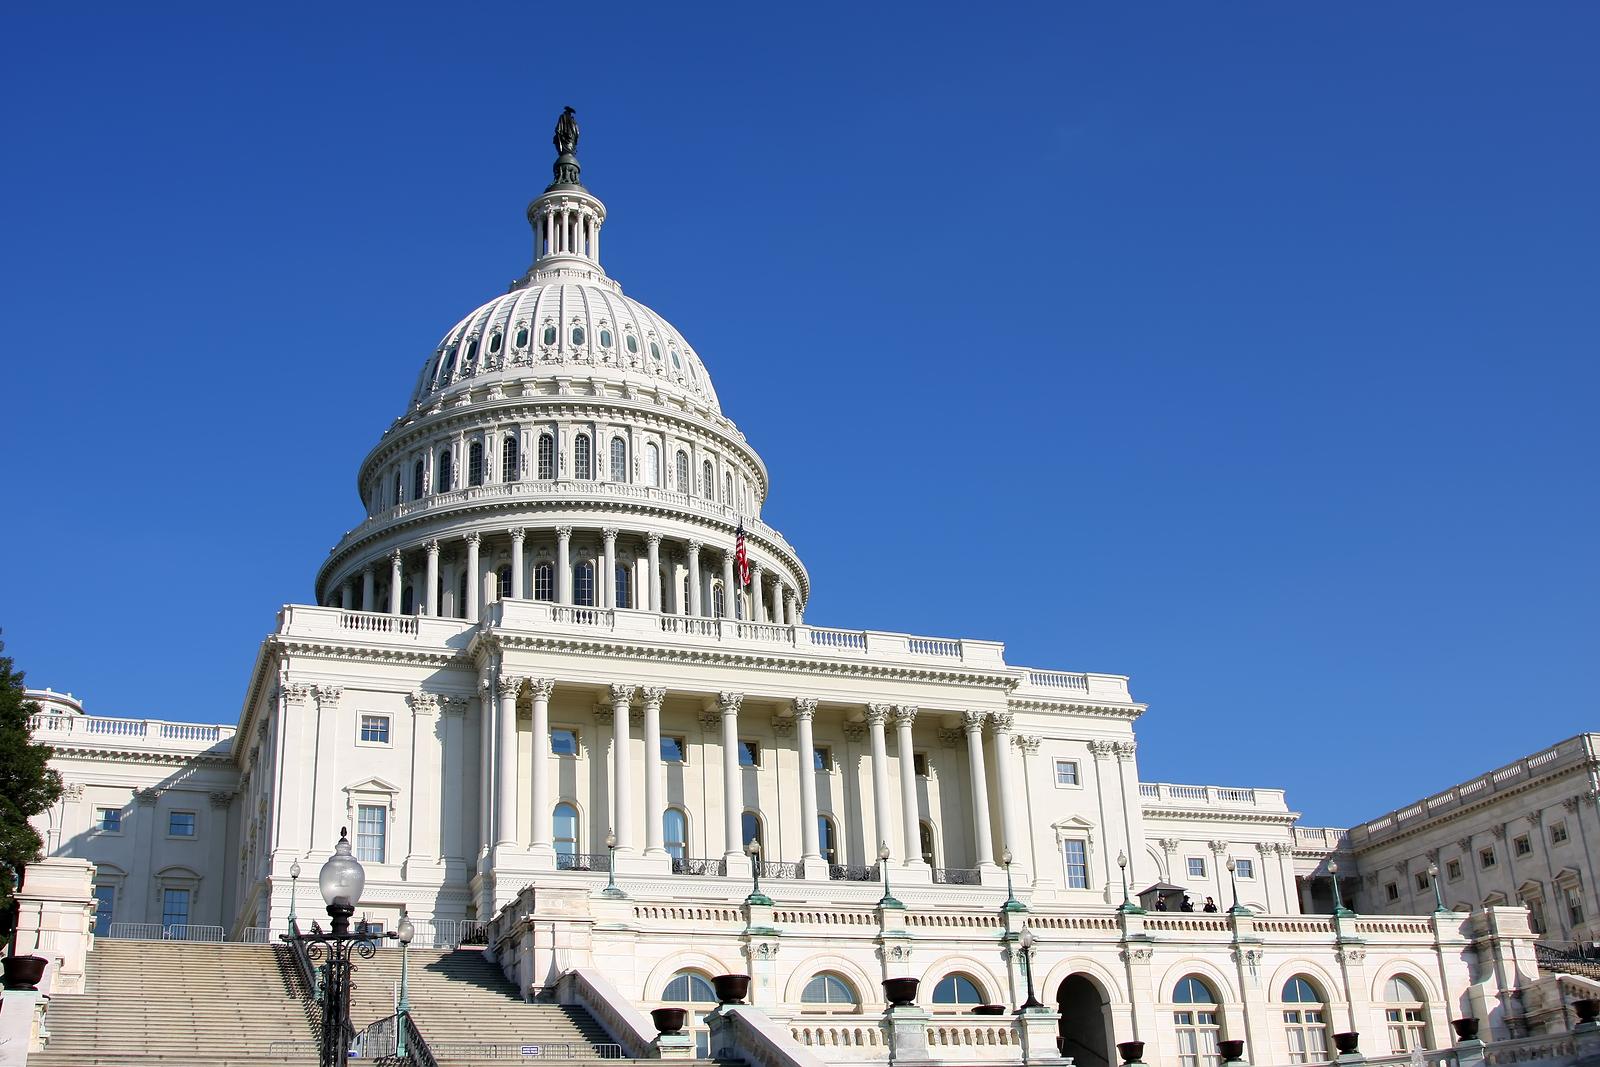 US Capitol, Washington DC, where Obamacare was passed